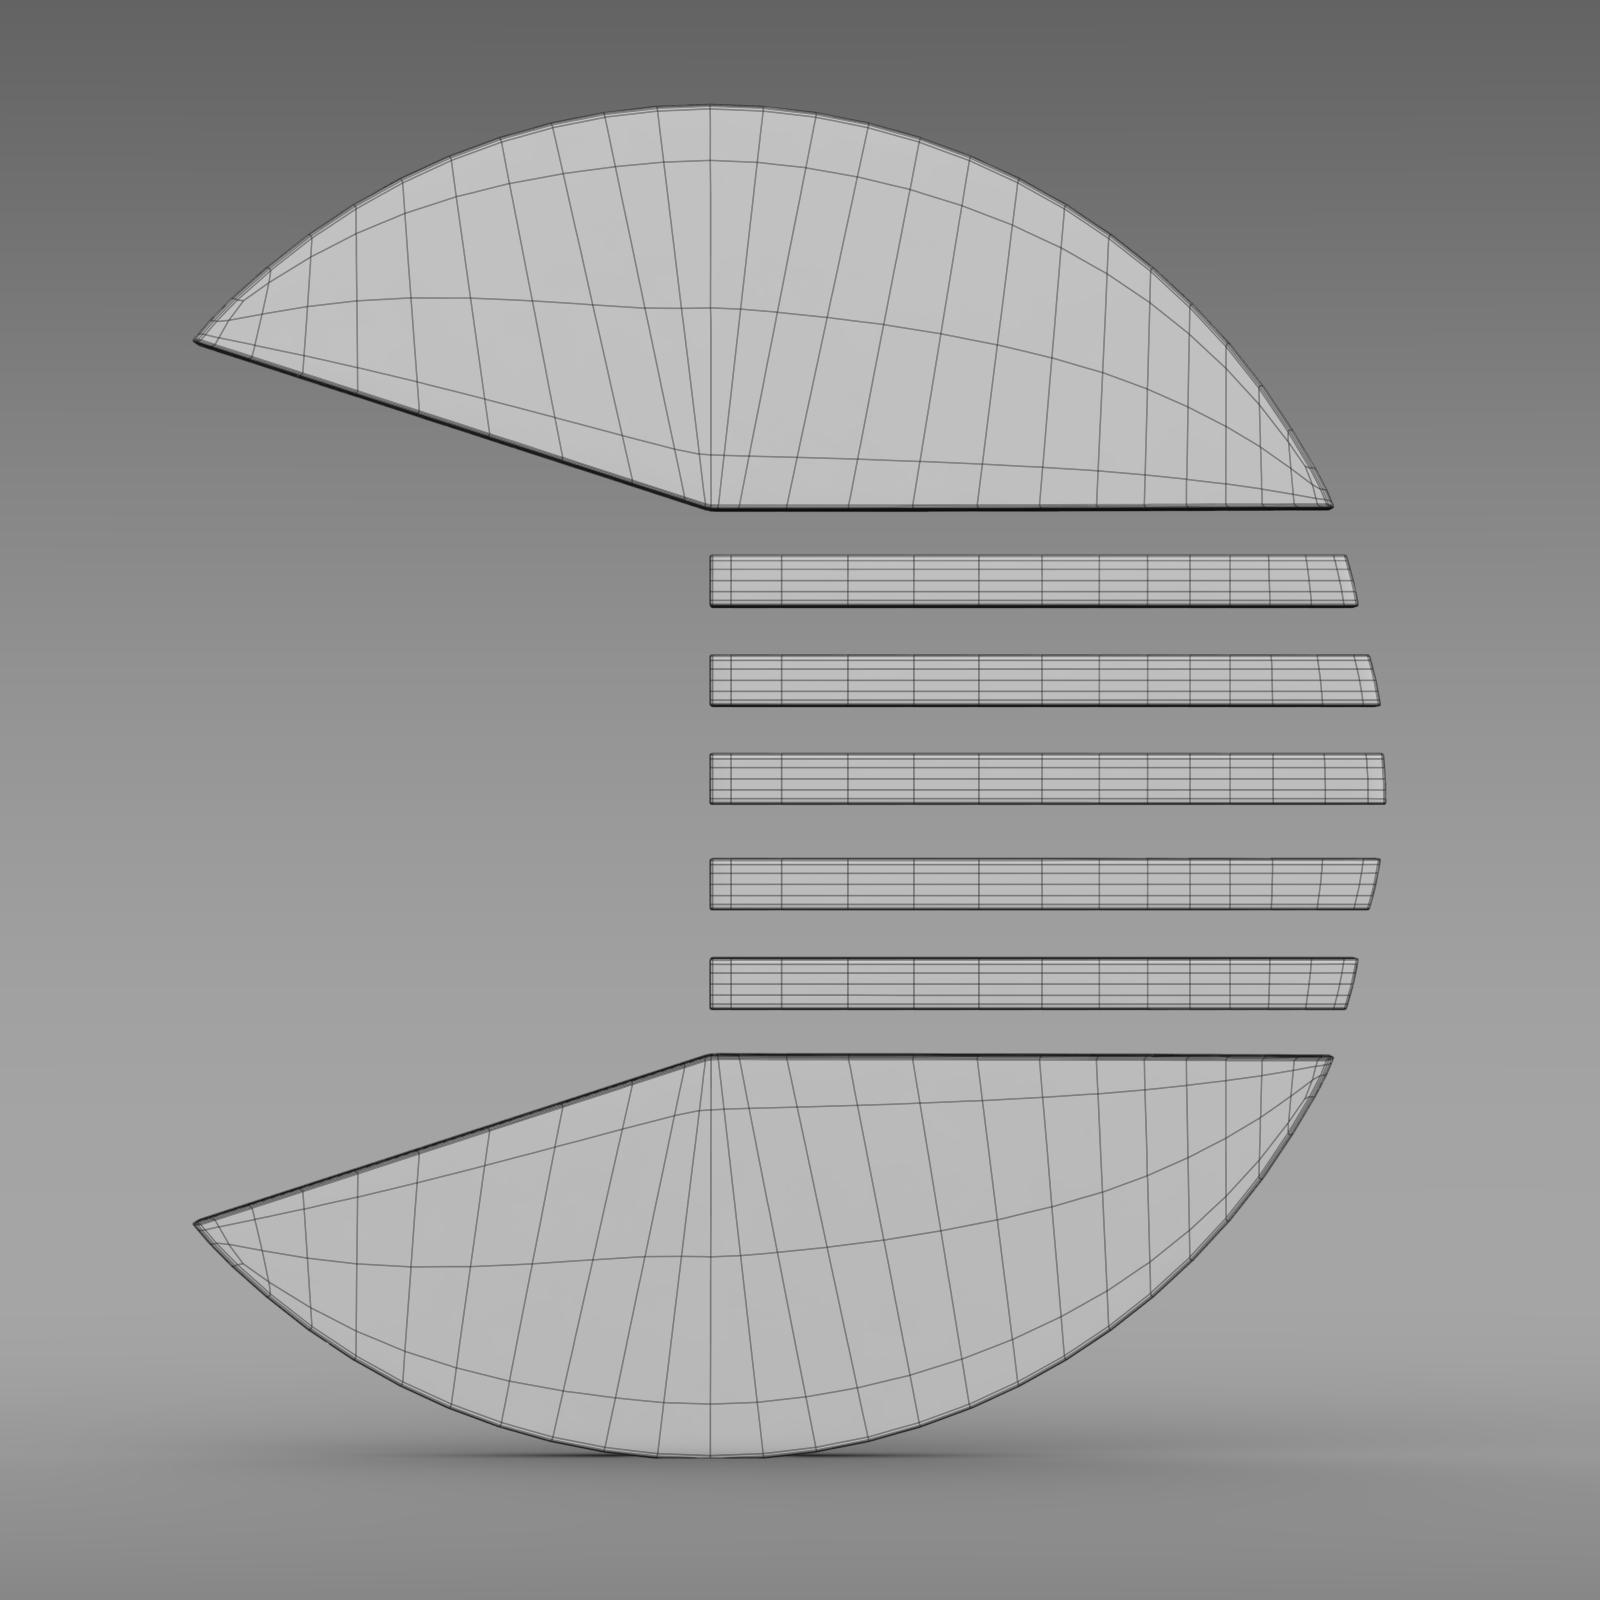 quant logo 3d model 3ds max fbx c4d lwo ma mb hrc xsi obj 213262